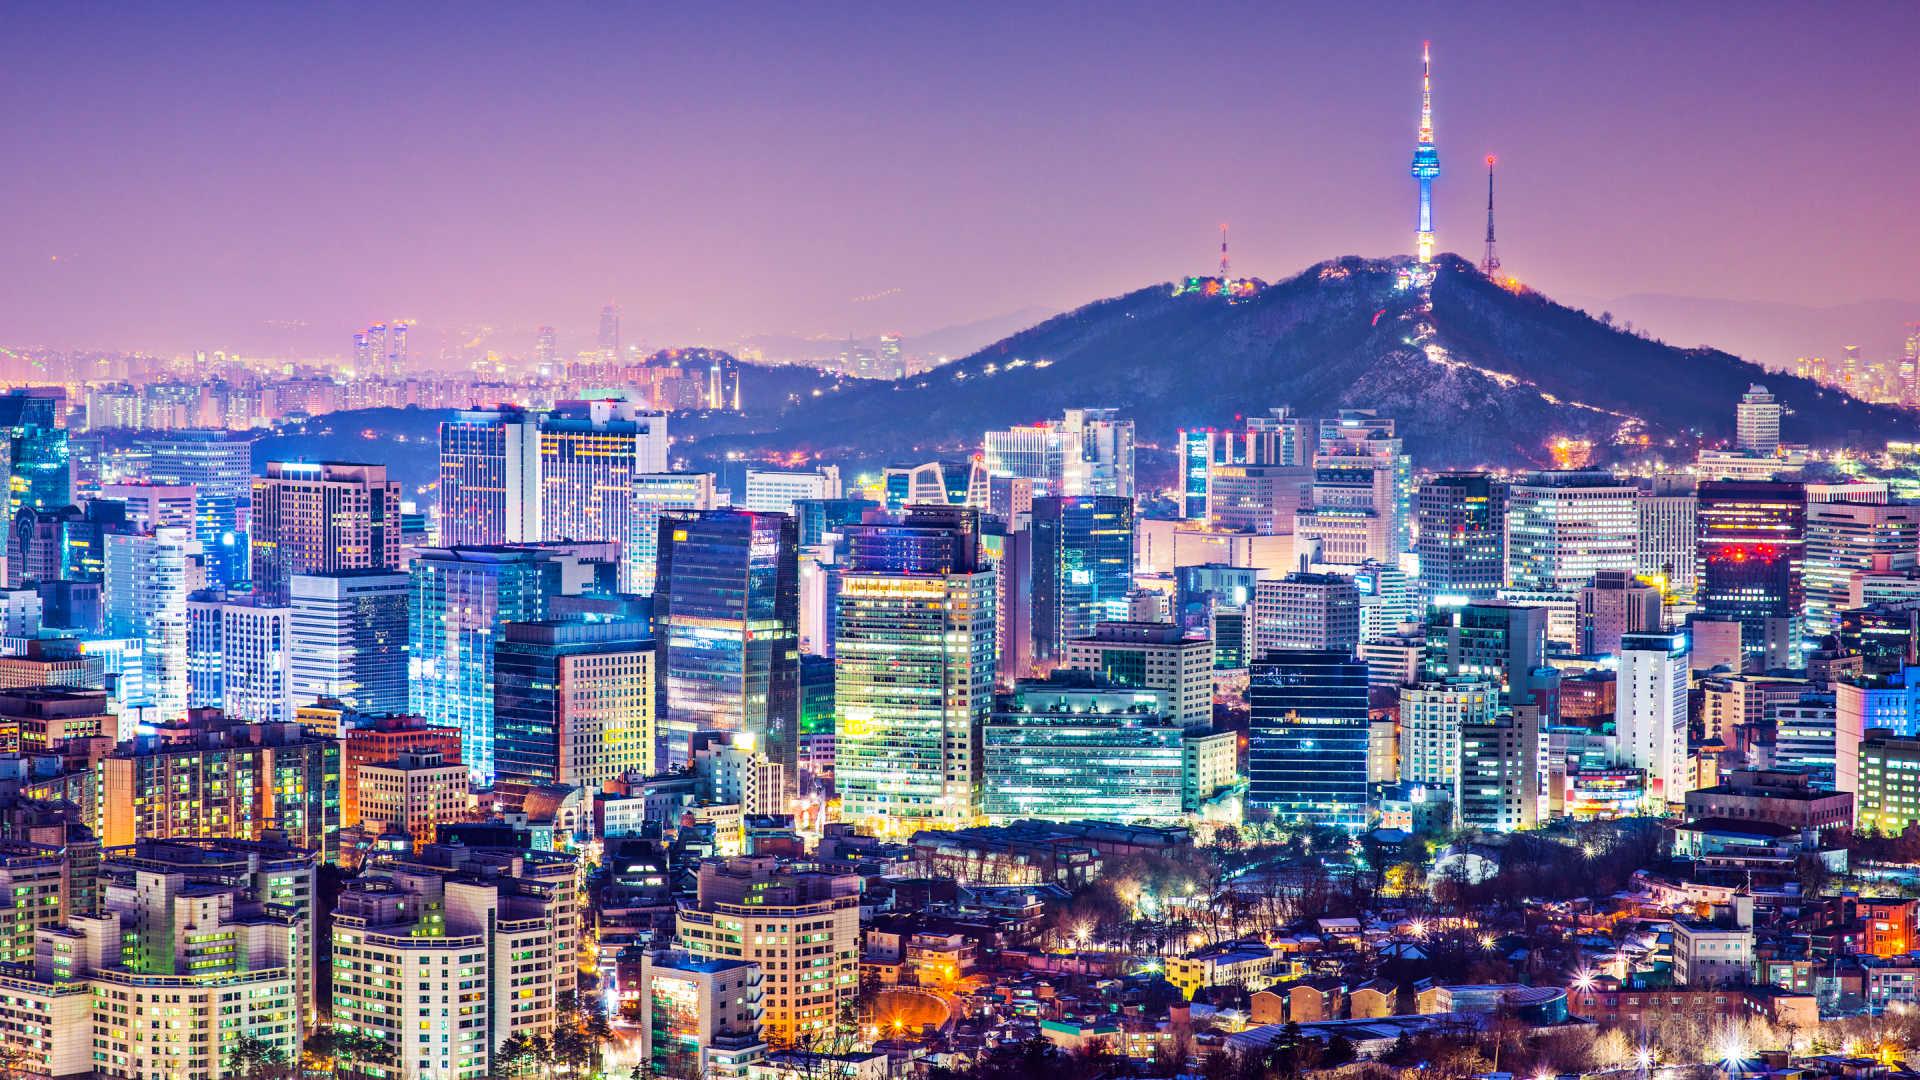 韓國,圖片取自www.kuoni.co.uk。